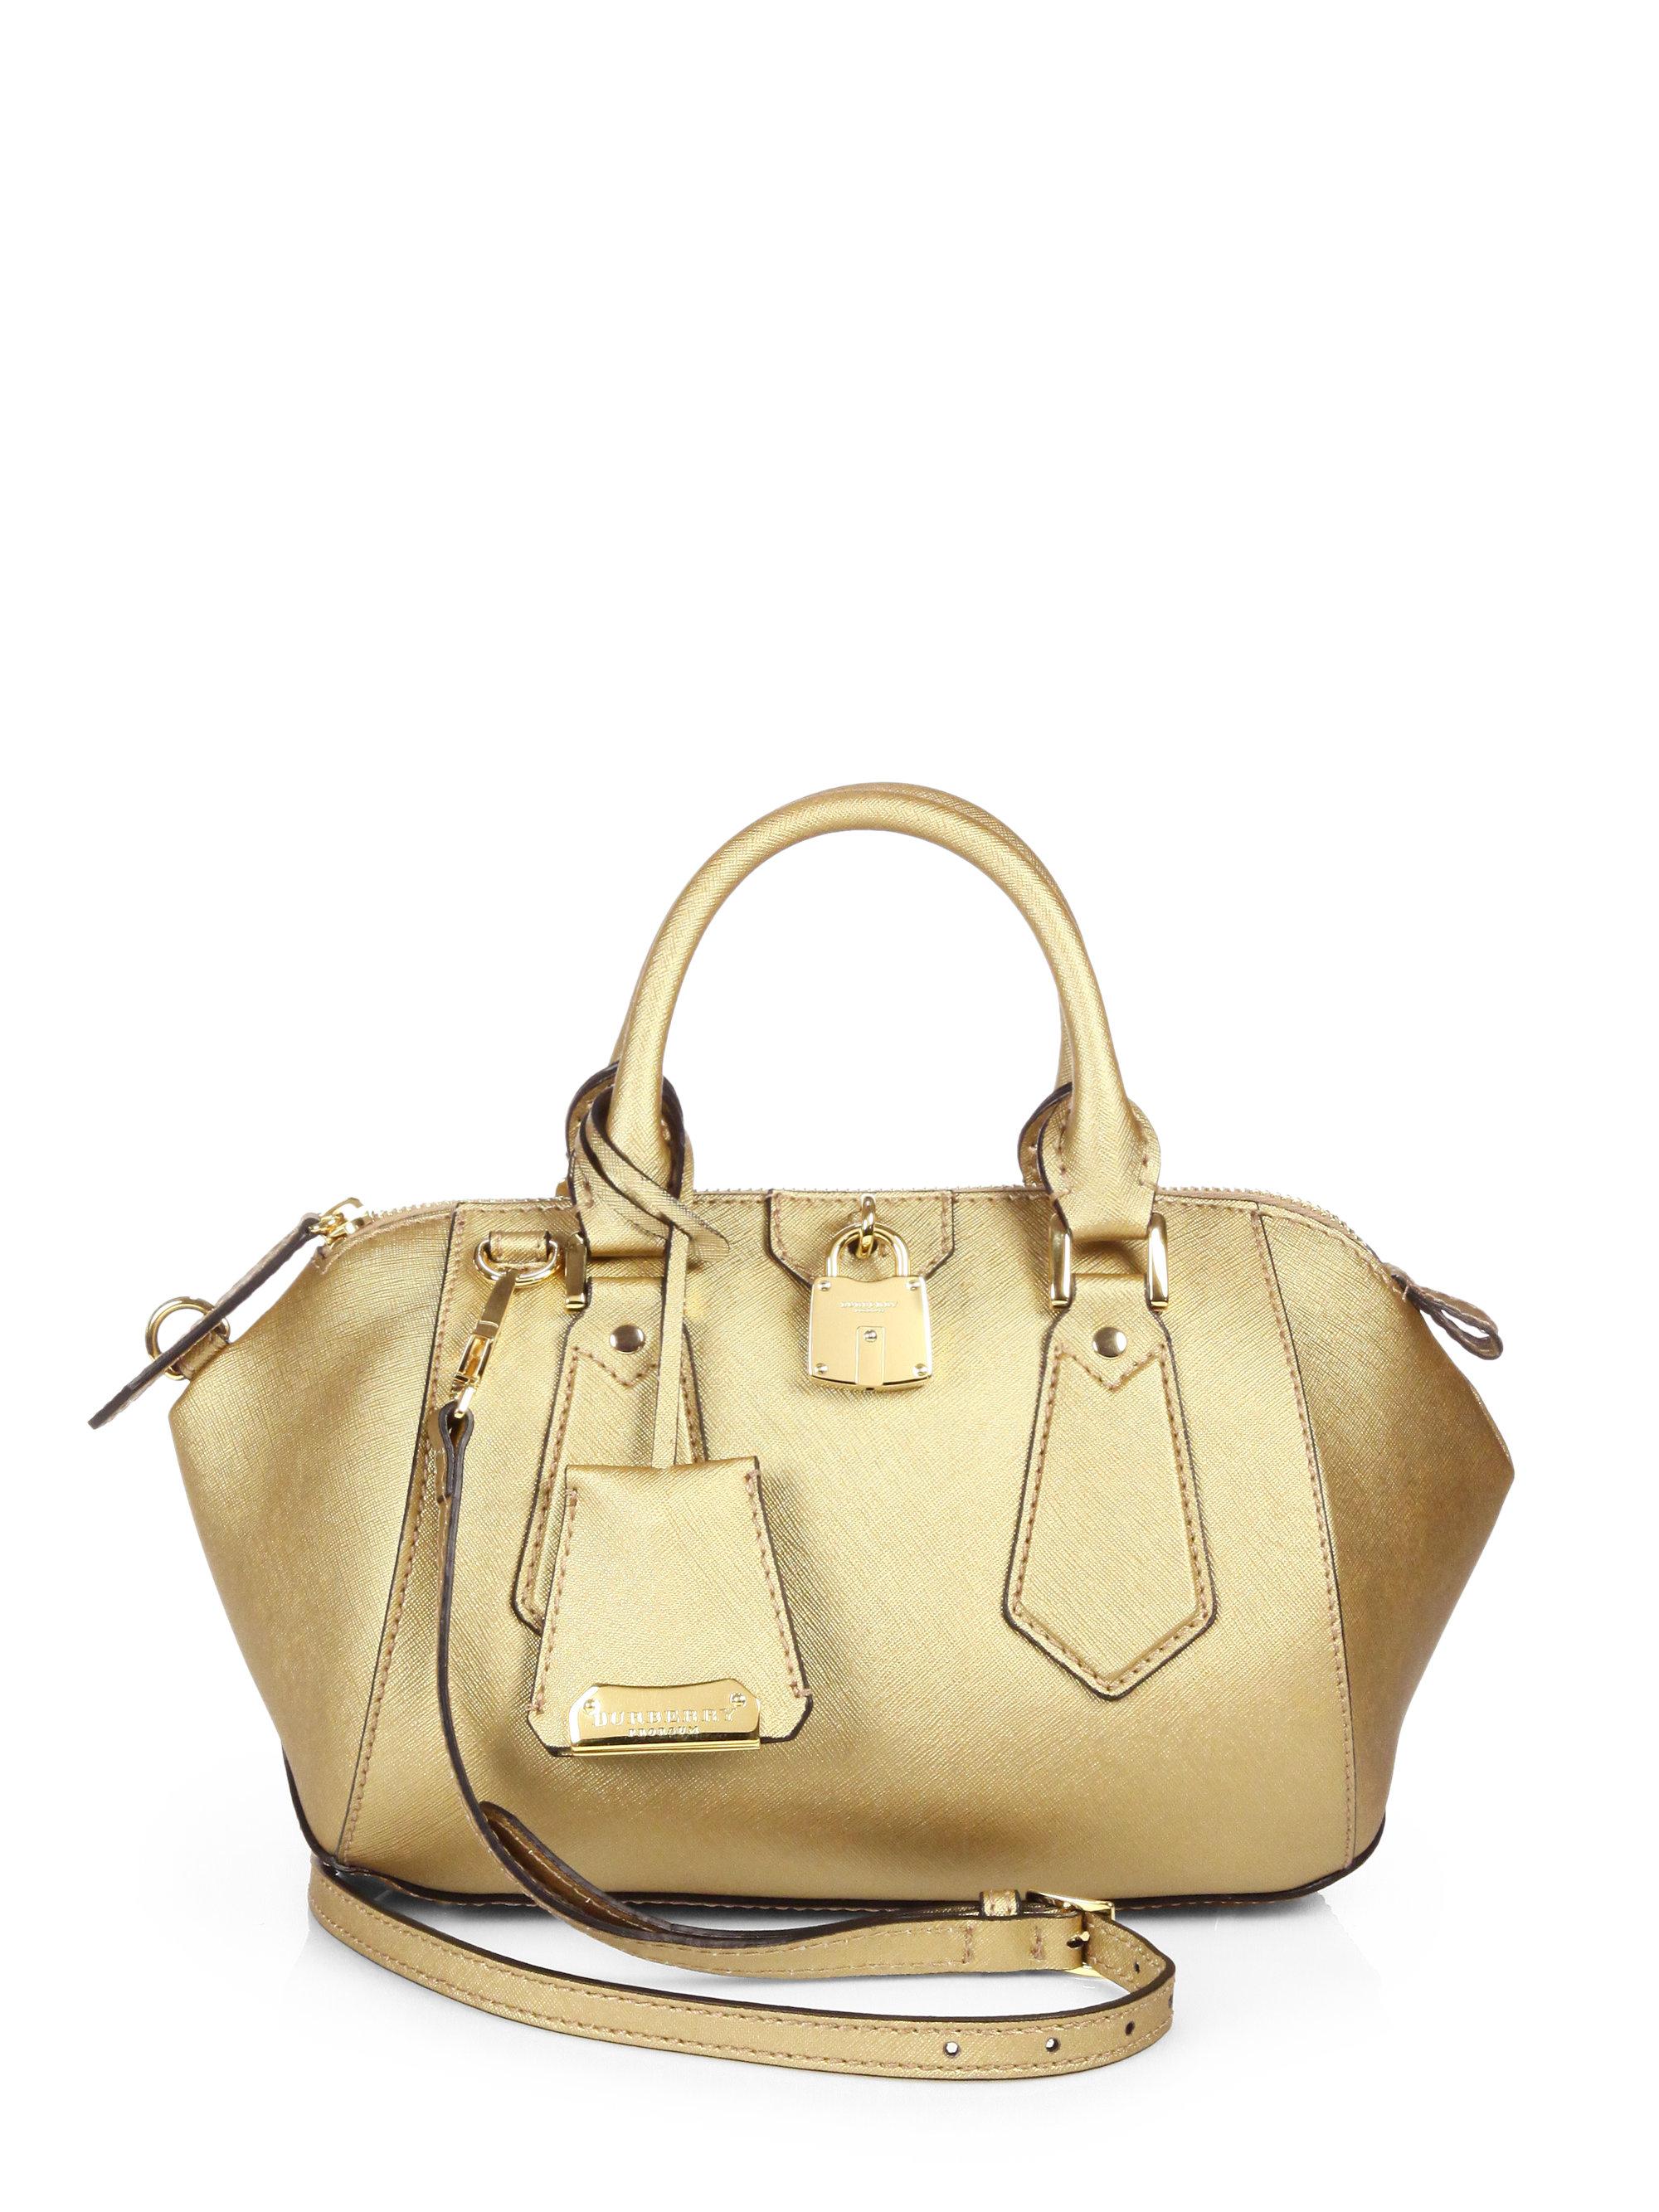 e97e48782123 Lyst - Burberry Prorsum Blaze Metallic Satchel Handbag in Metallic